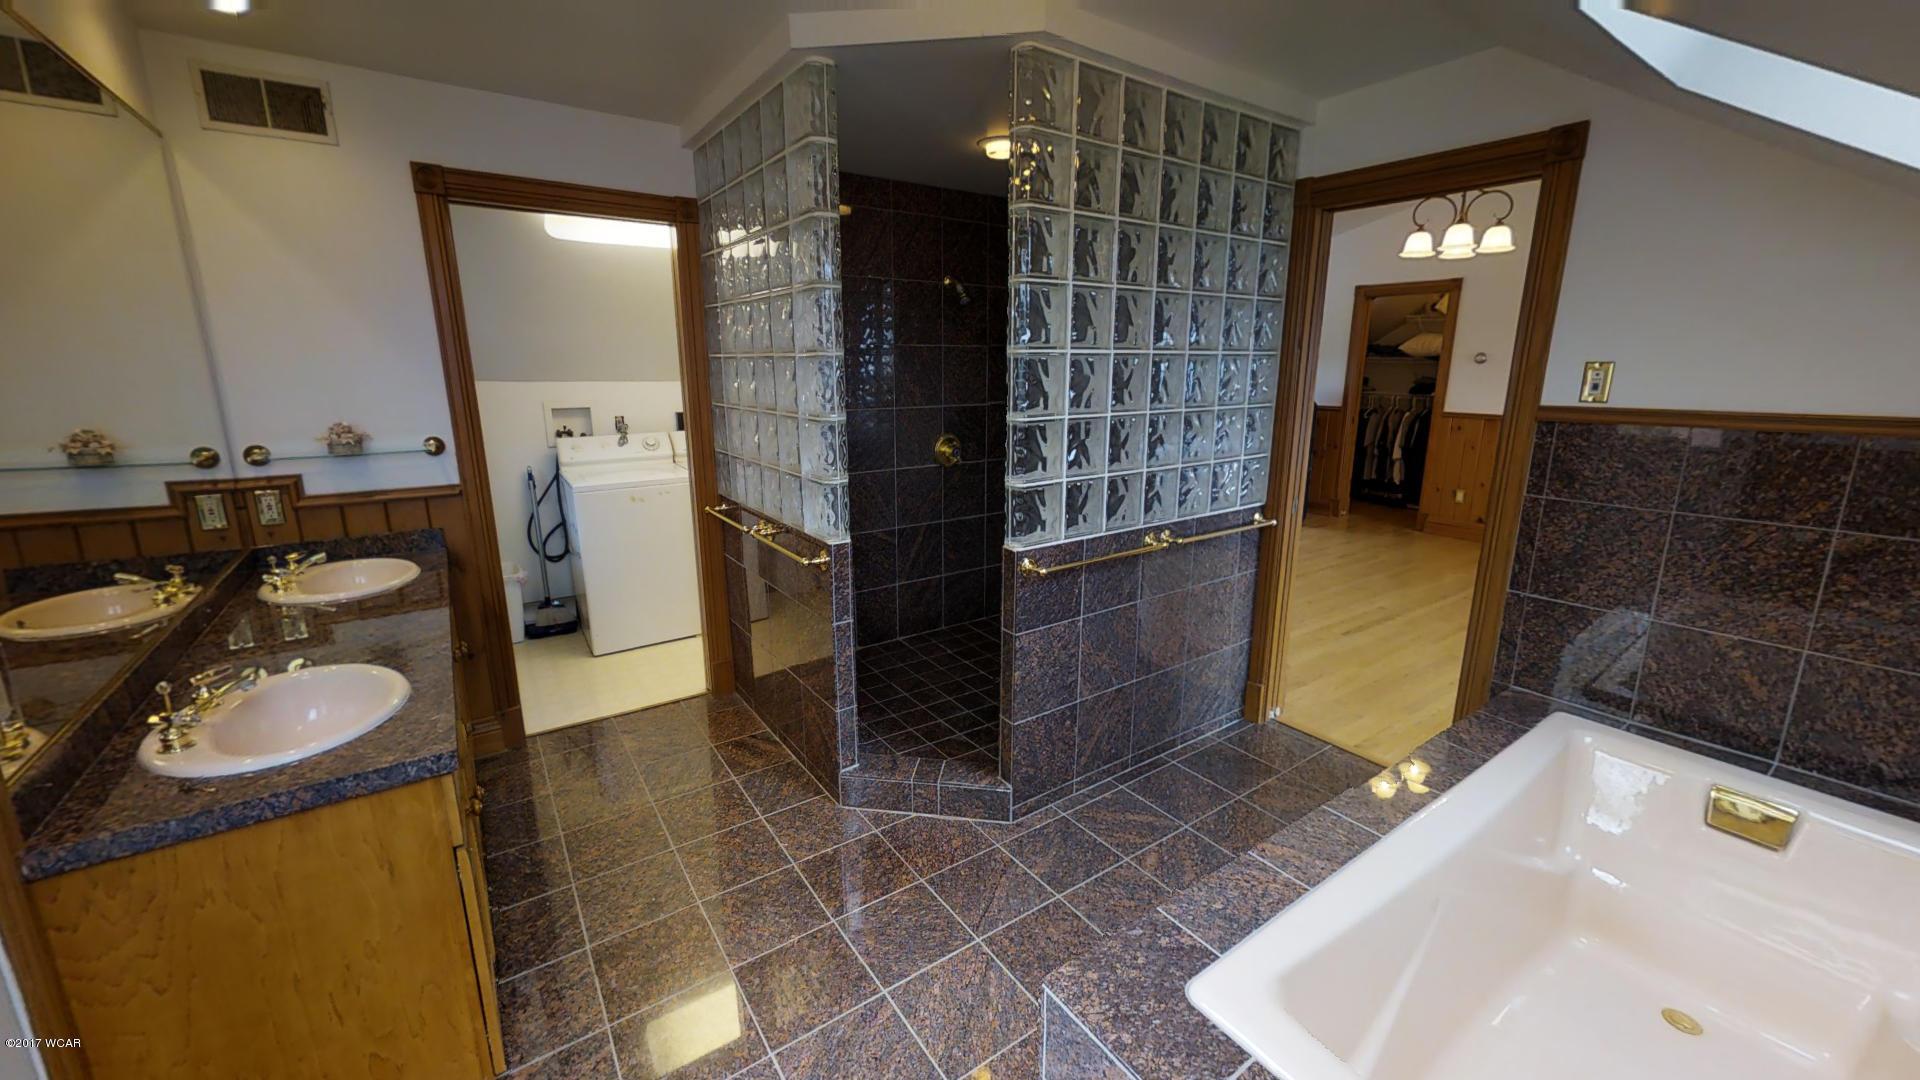 7911 N Shore Drive,Spicer,3 Bedrooms Bedrooms,2 BathroomsBathrooms,Single Family,N Shore Drive,6026643